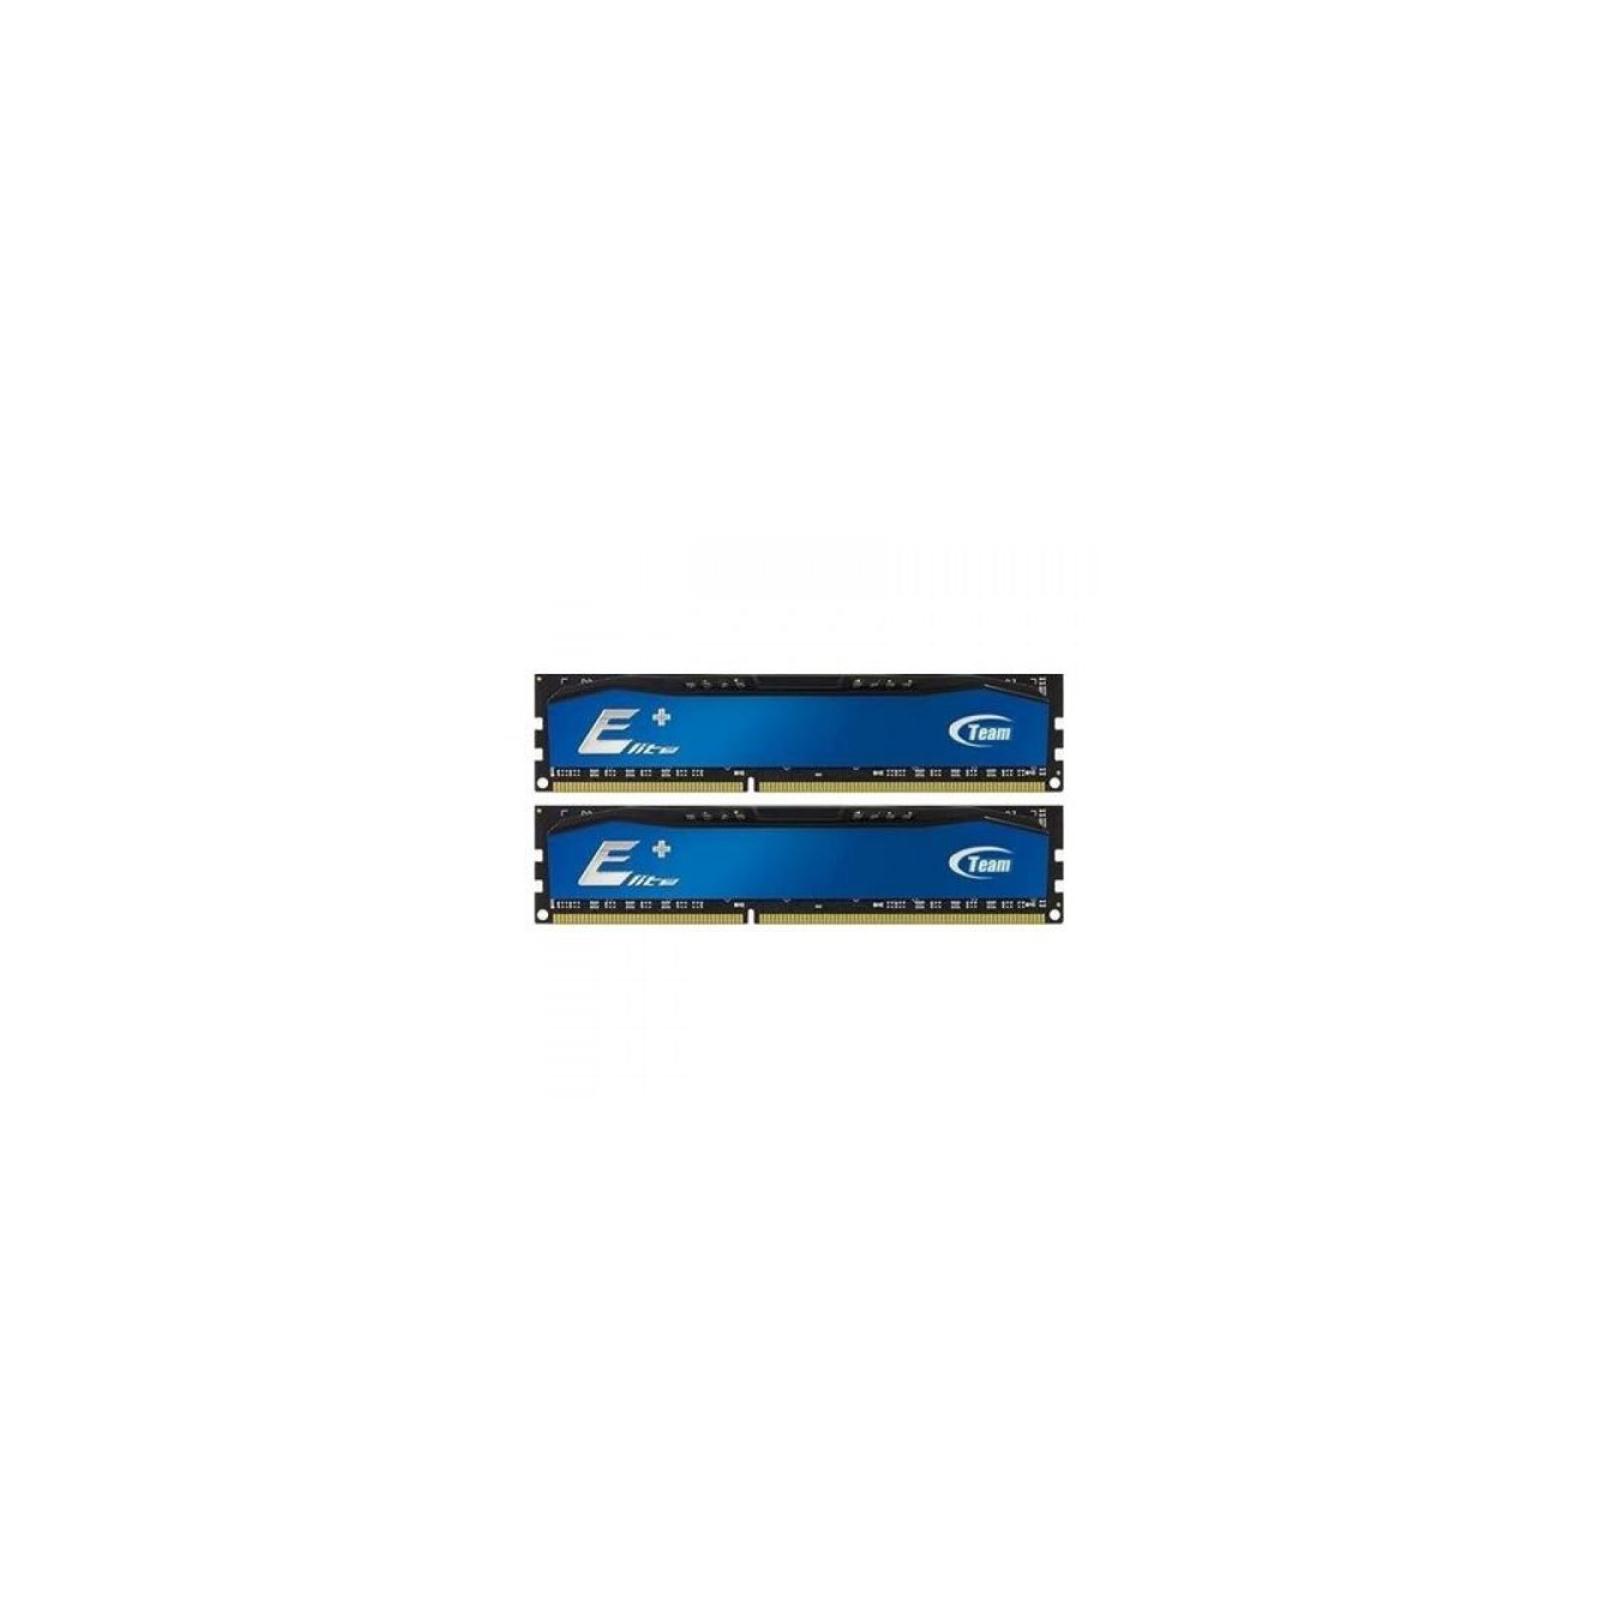 Модуль памяти для компьютера DDR4 16GB (2x8Gb) 2400 MHz Elite Plus Blue Team (TPBD416G2400HC16DC01)